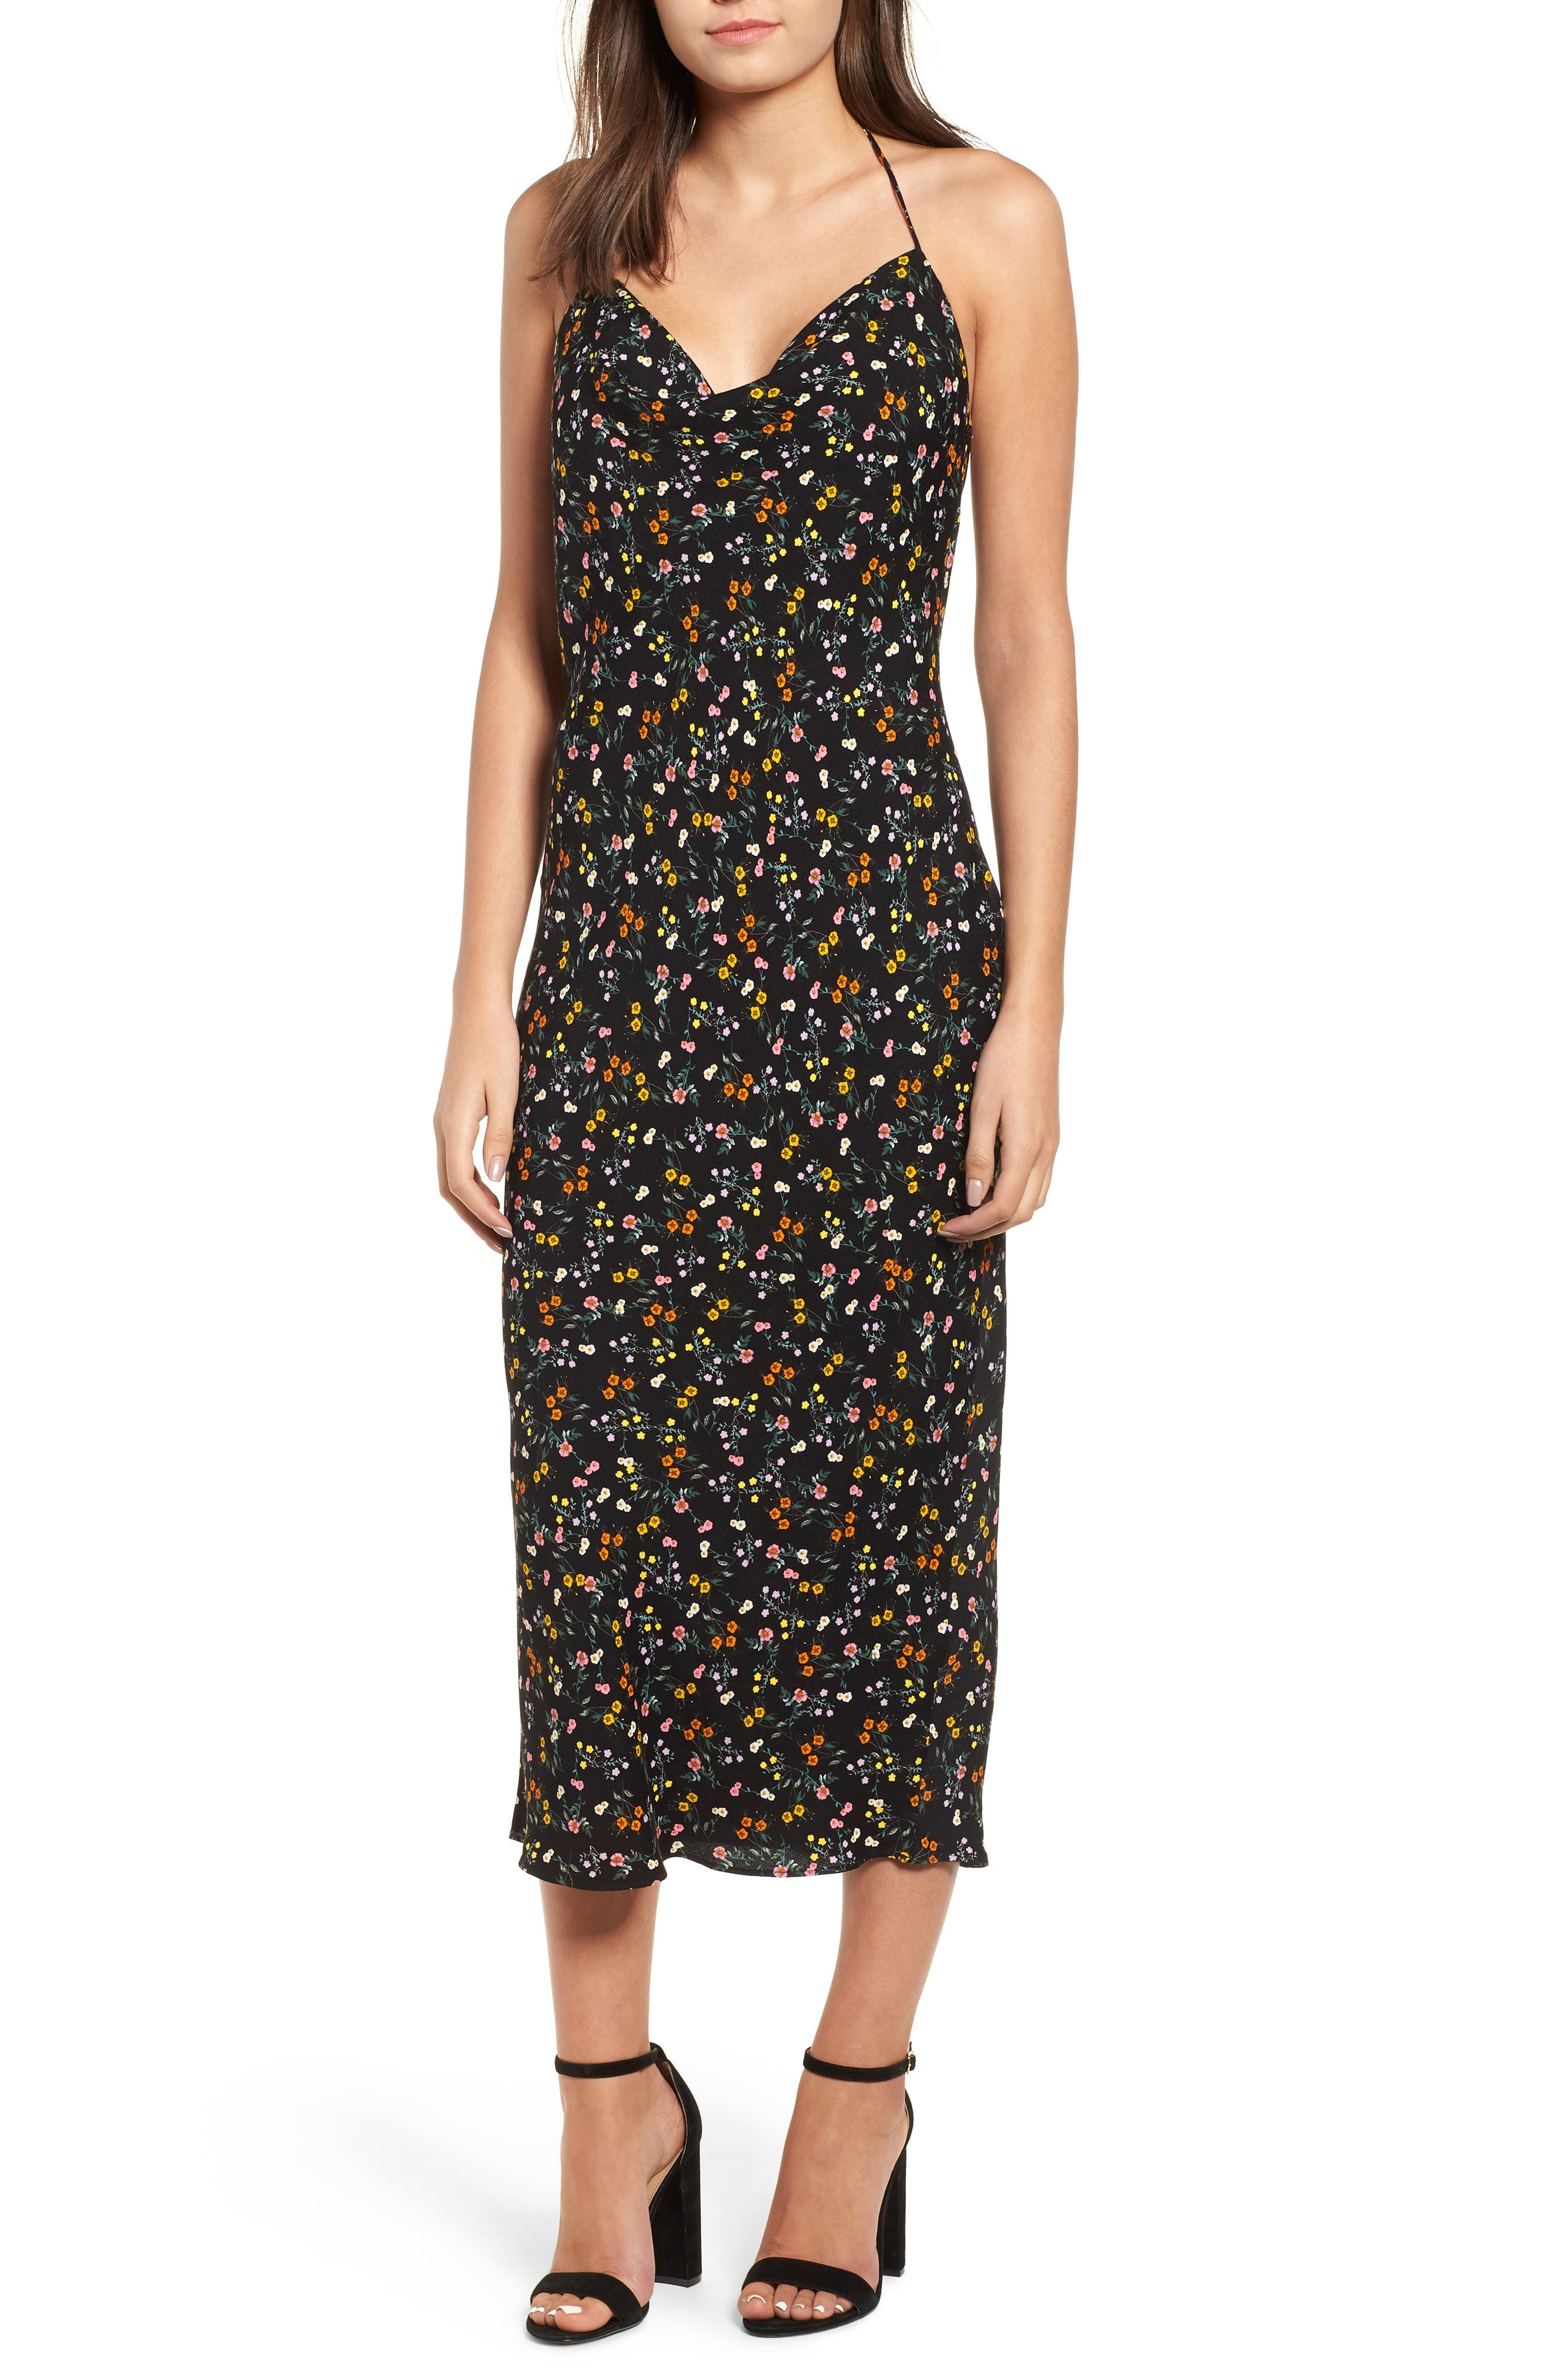 Rowland Midi Dress,                             Main thumbnail 1, color,                             NOIR PETITE FLEUR